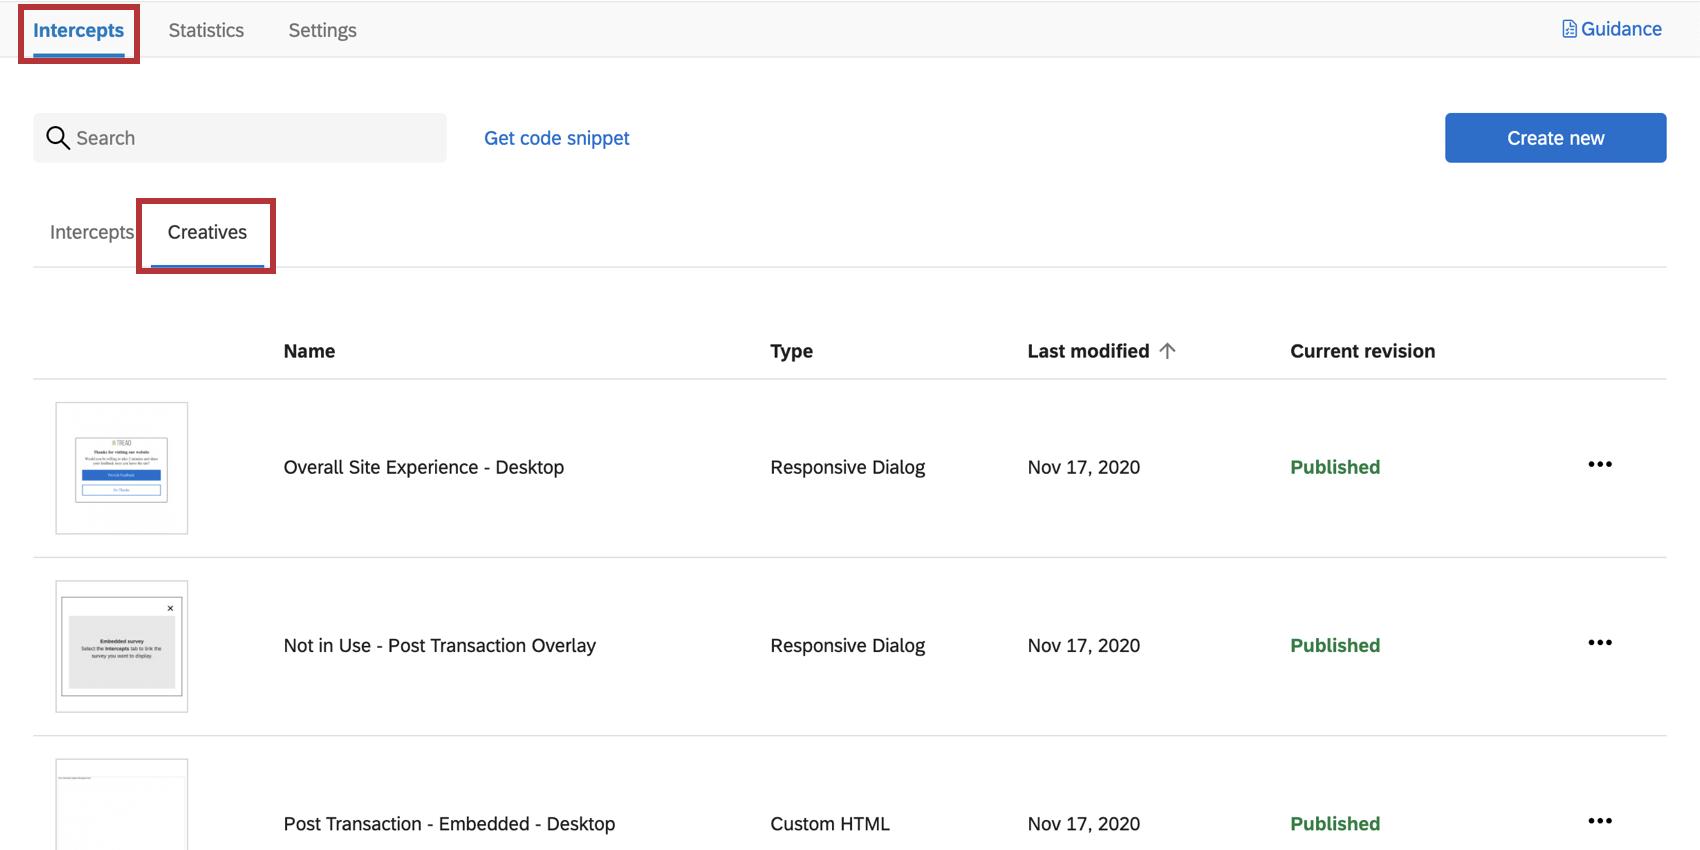 Intercepts tab, creatives section